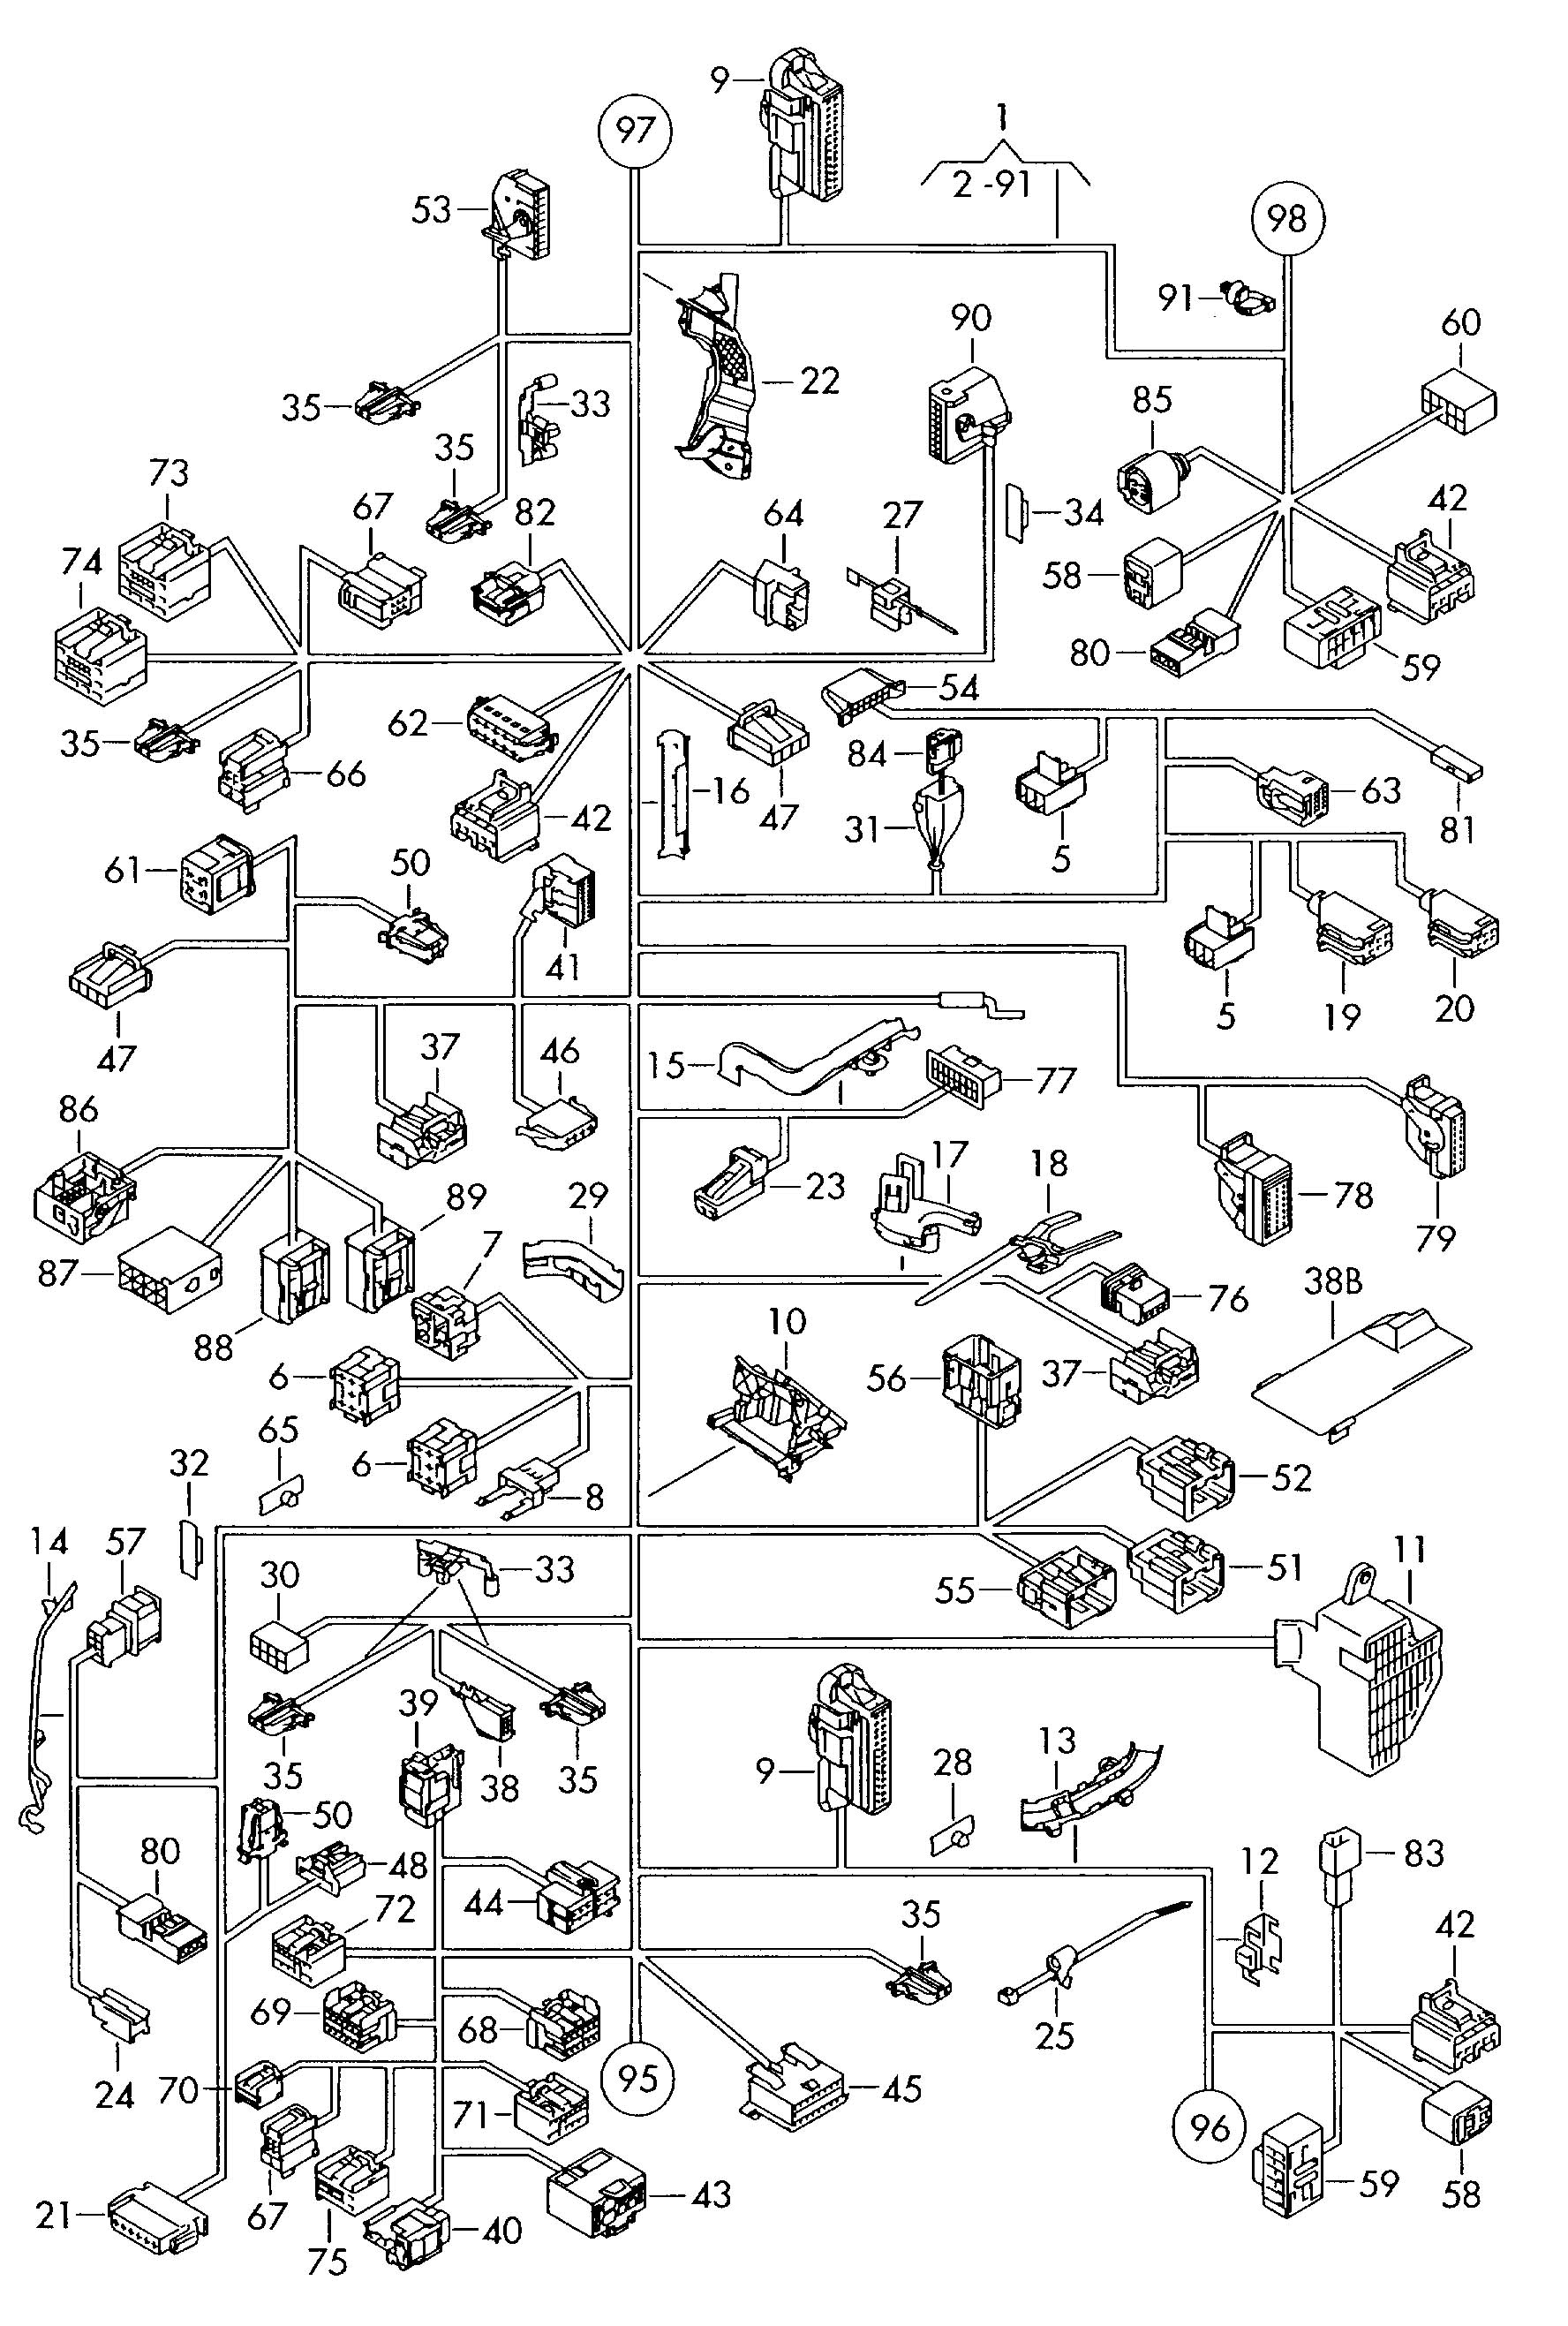 Rabbit Wiring Harness Wiring Diagram Motorcycle